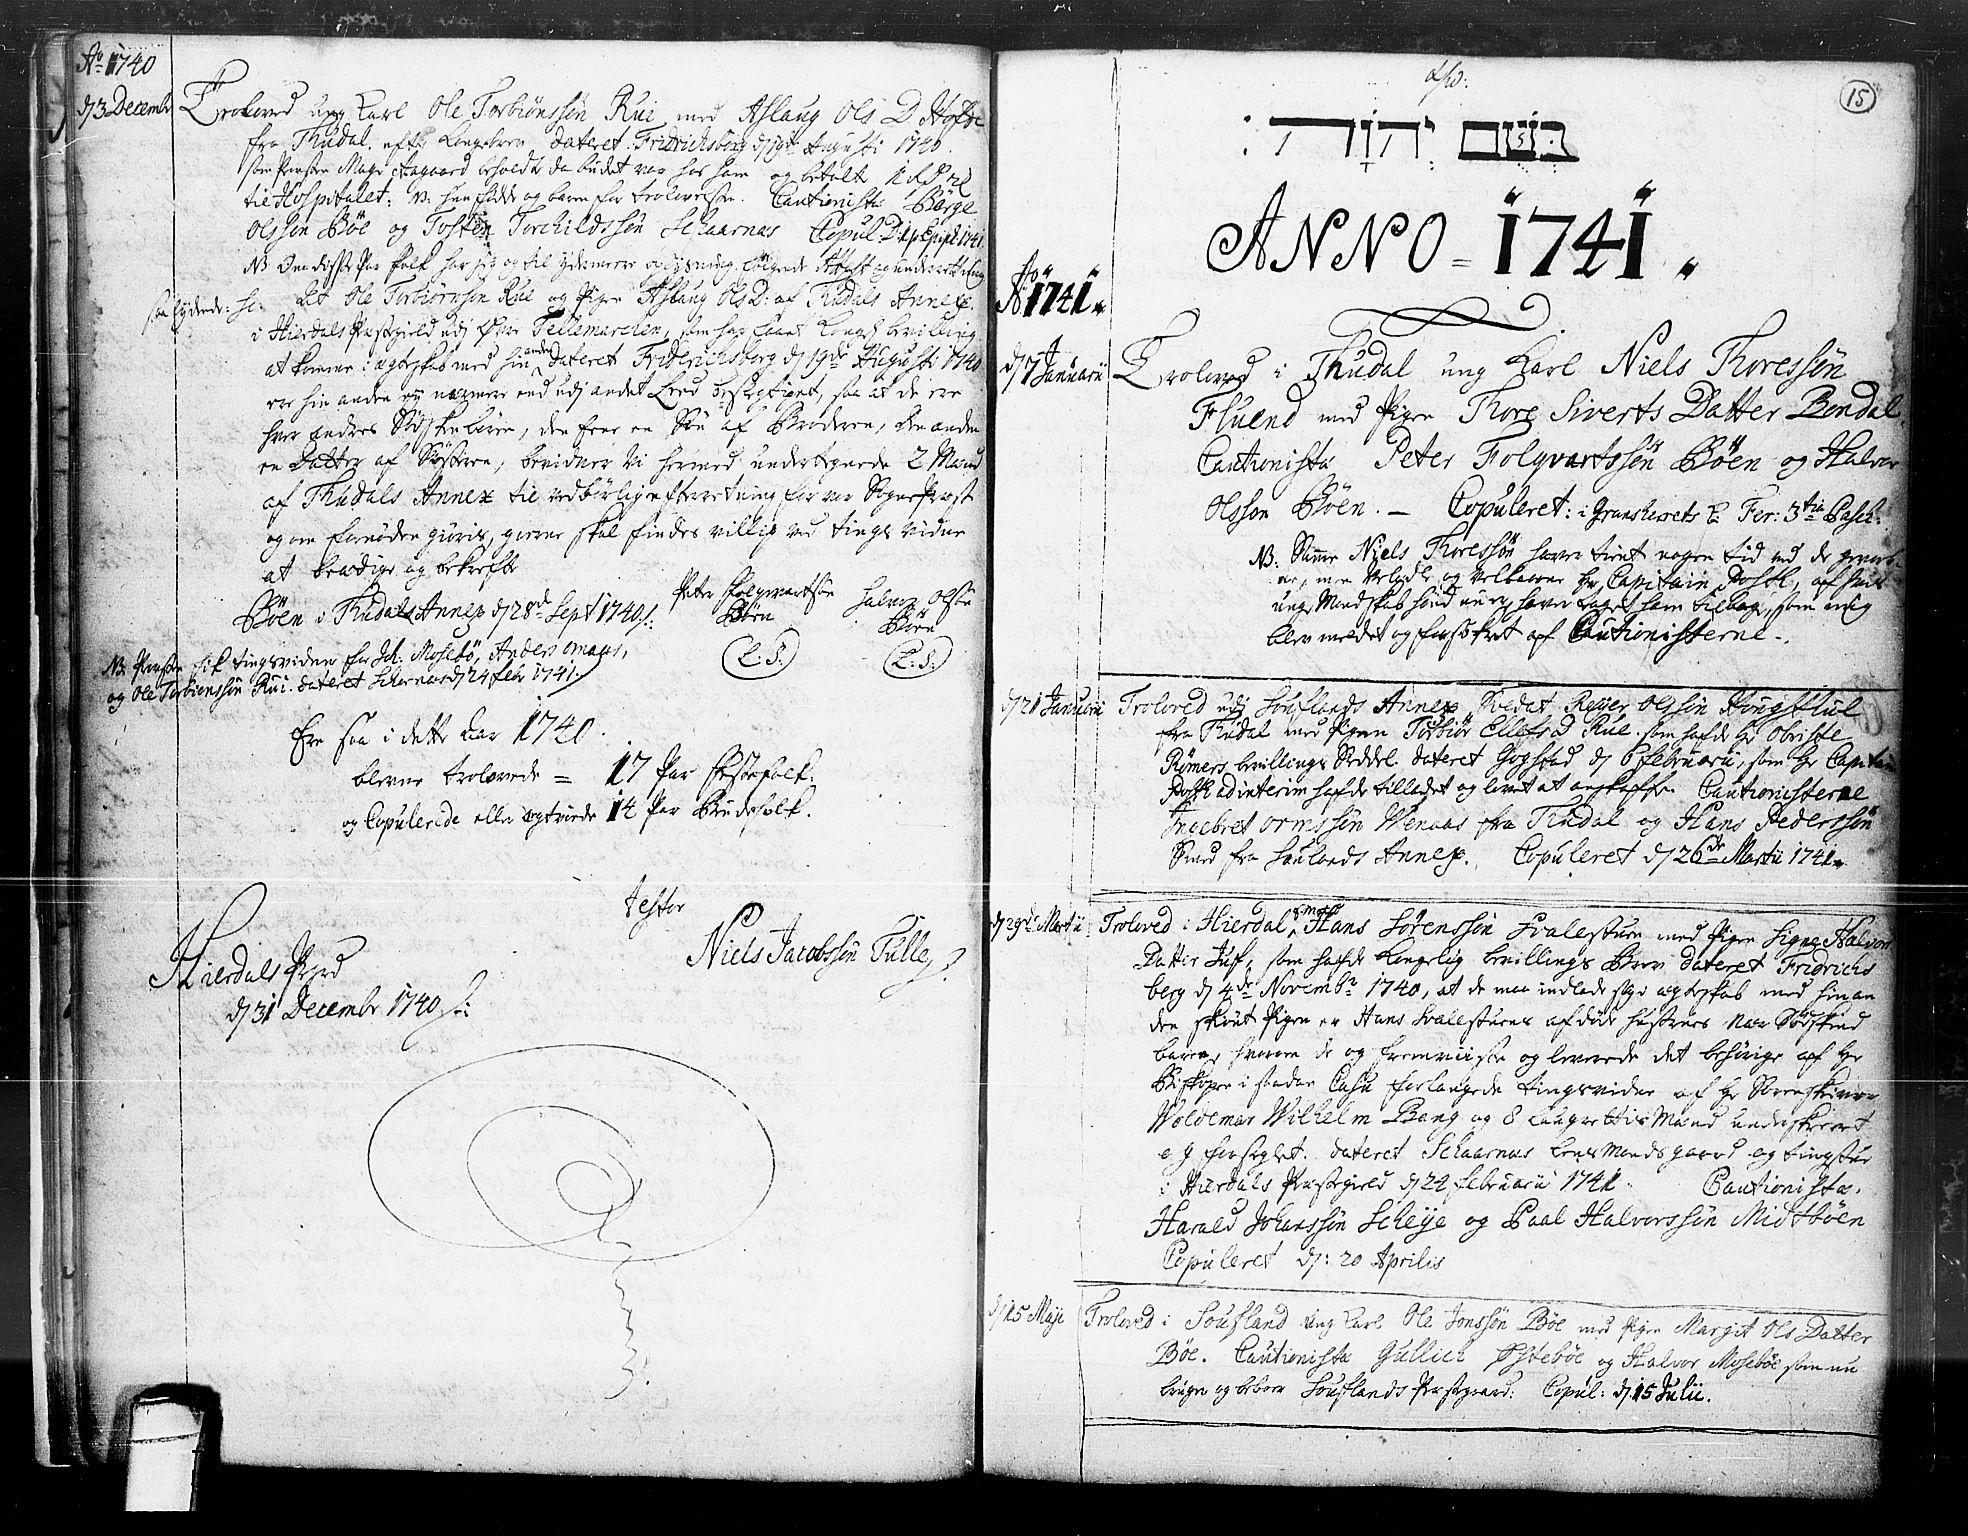 SAKO, Hjartdal kirkebøker, F/Fa/L0004: Ministerialbok nr. I 4, 1727-1795, s. 15